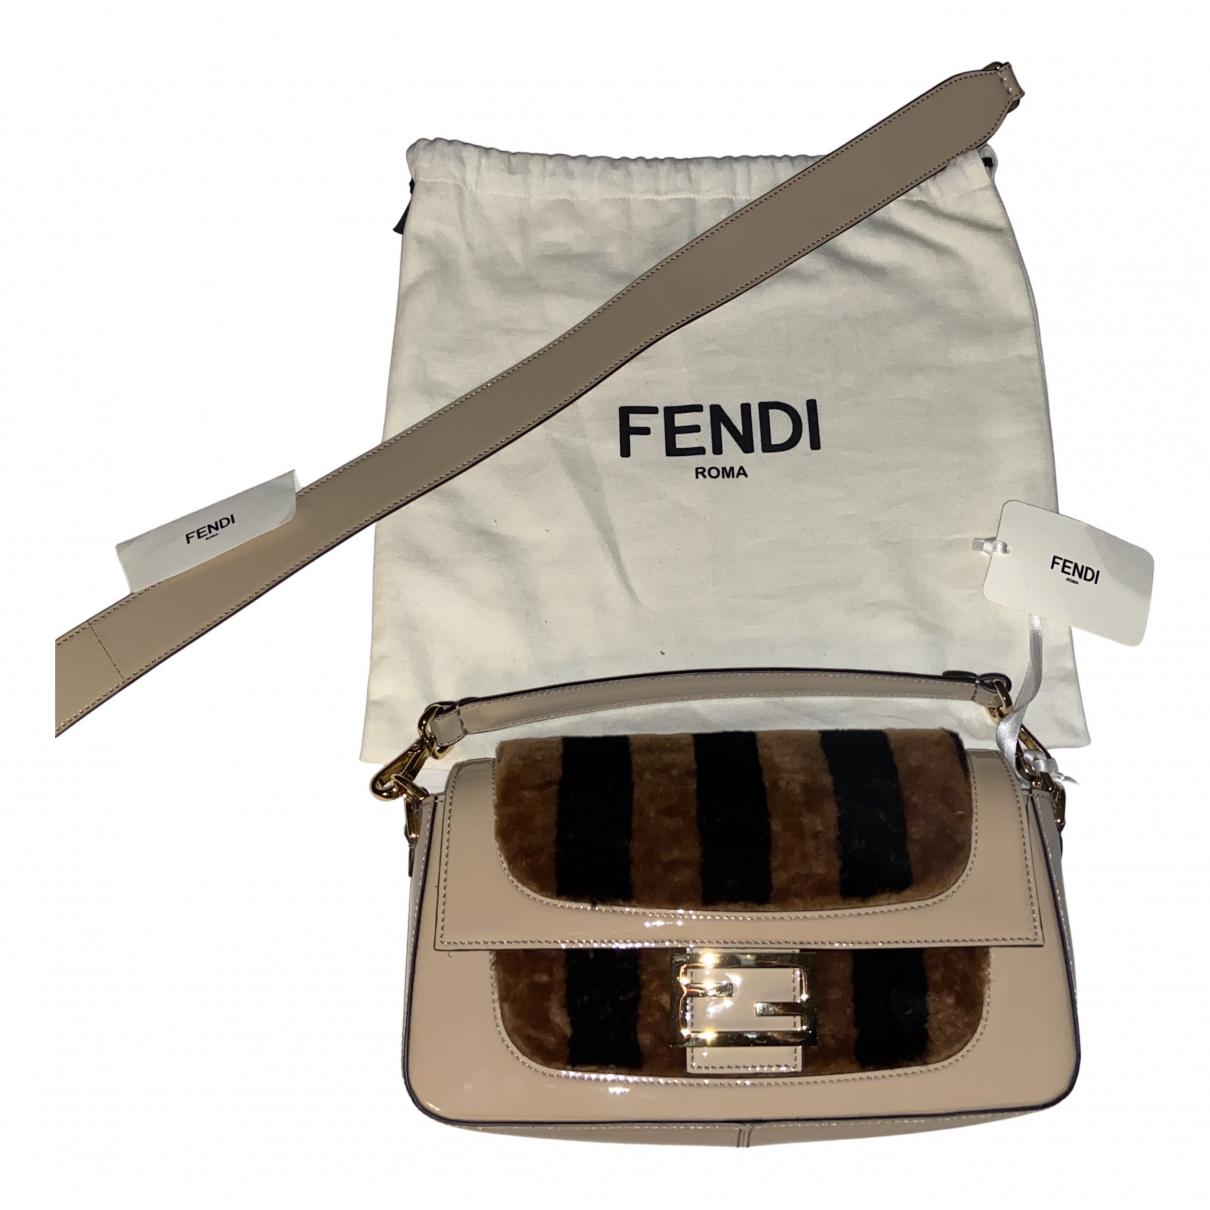 Fendi Baguette Beige Patent leather handbag for Women N